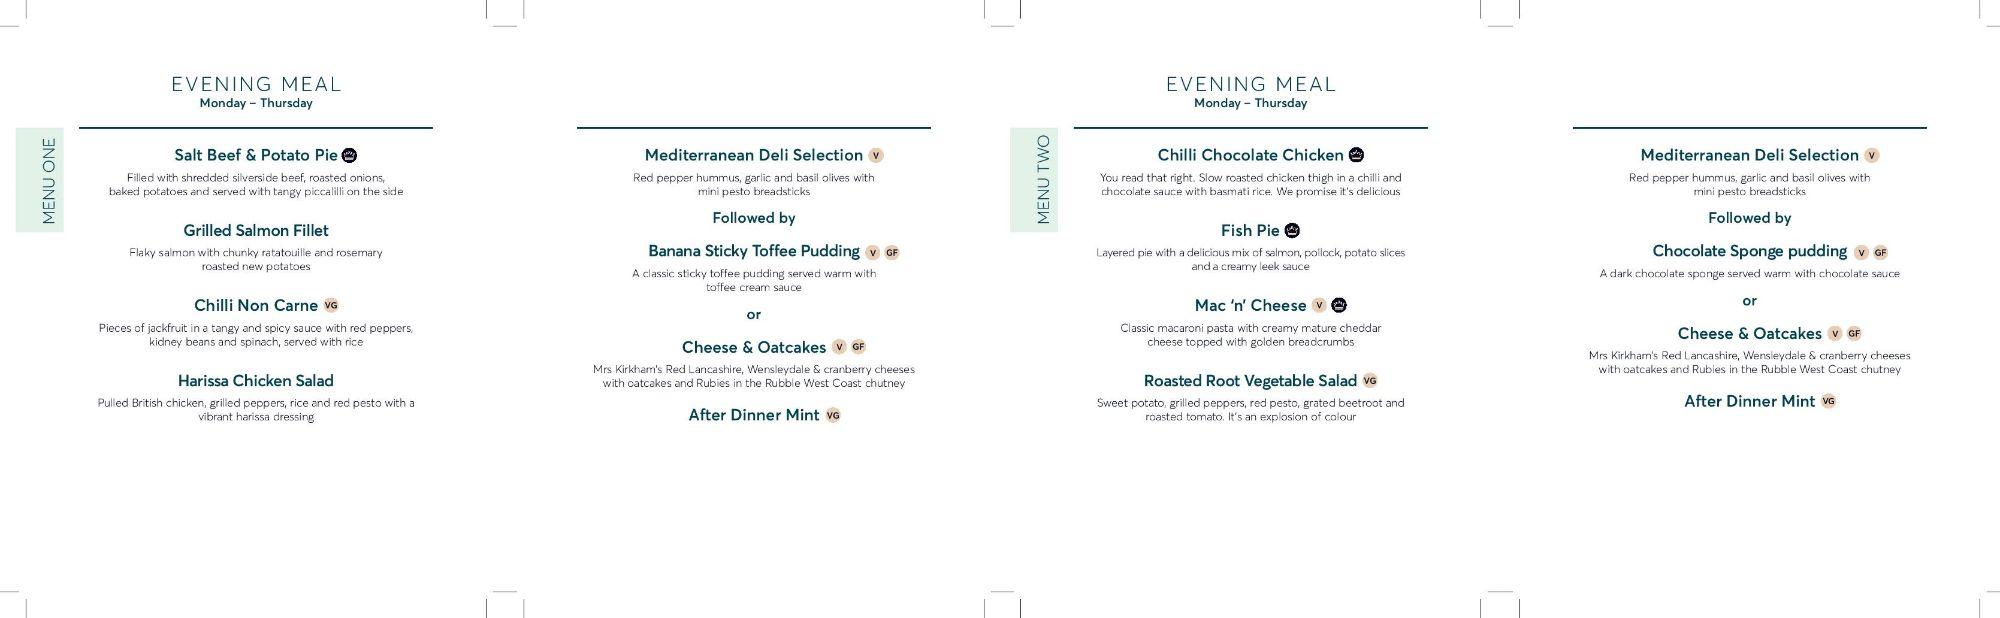 Image showing a sample of the Avanti West Coast evening menu, circa 2020.